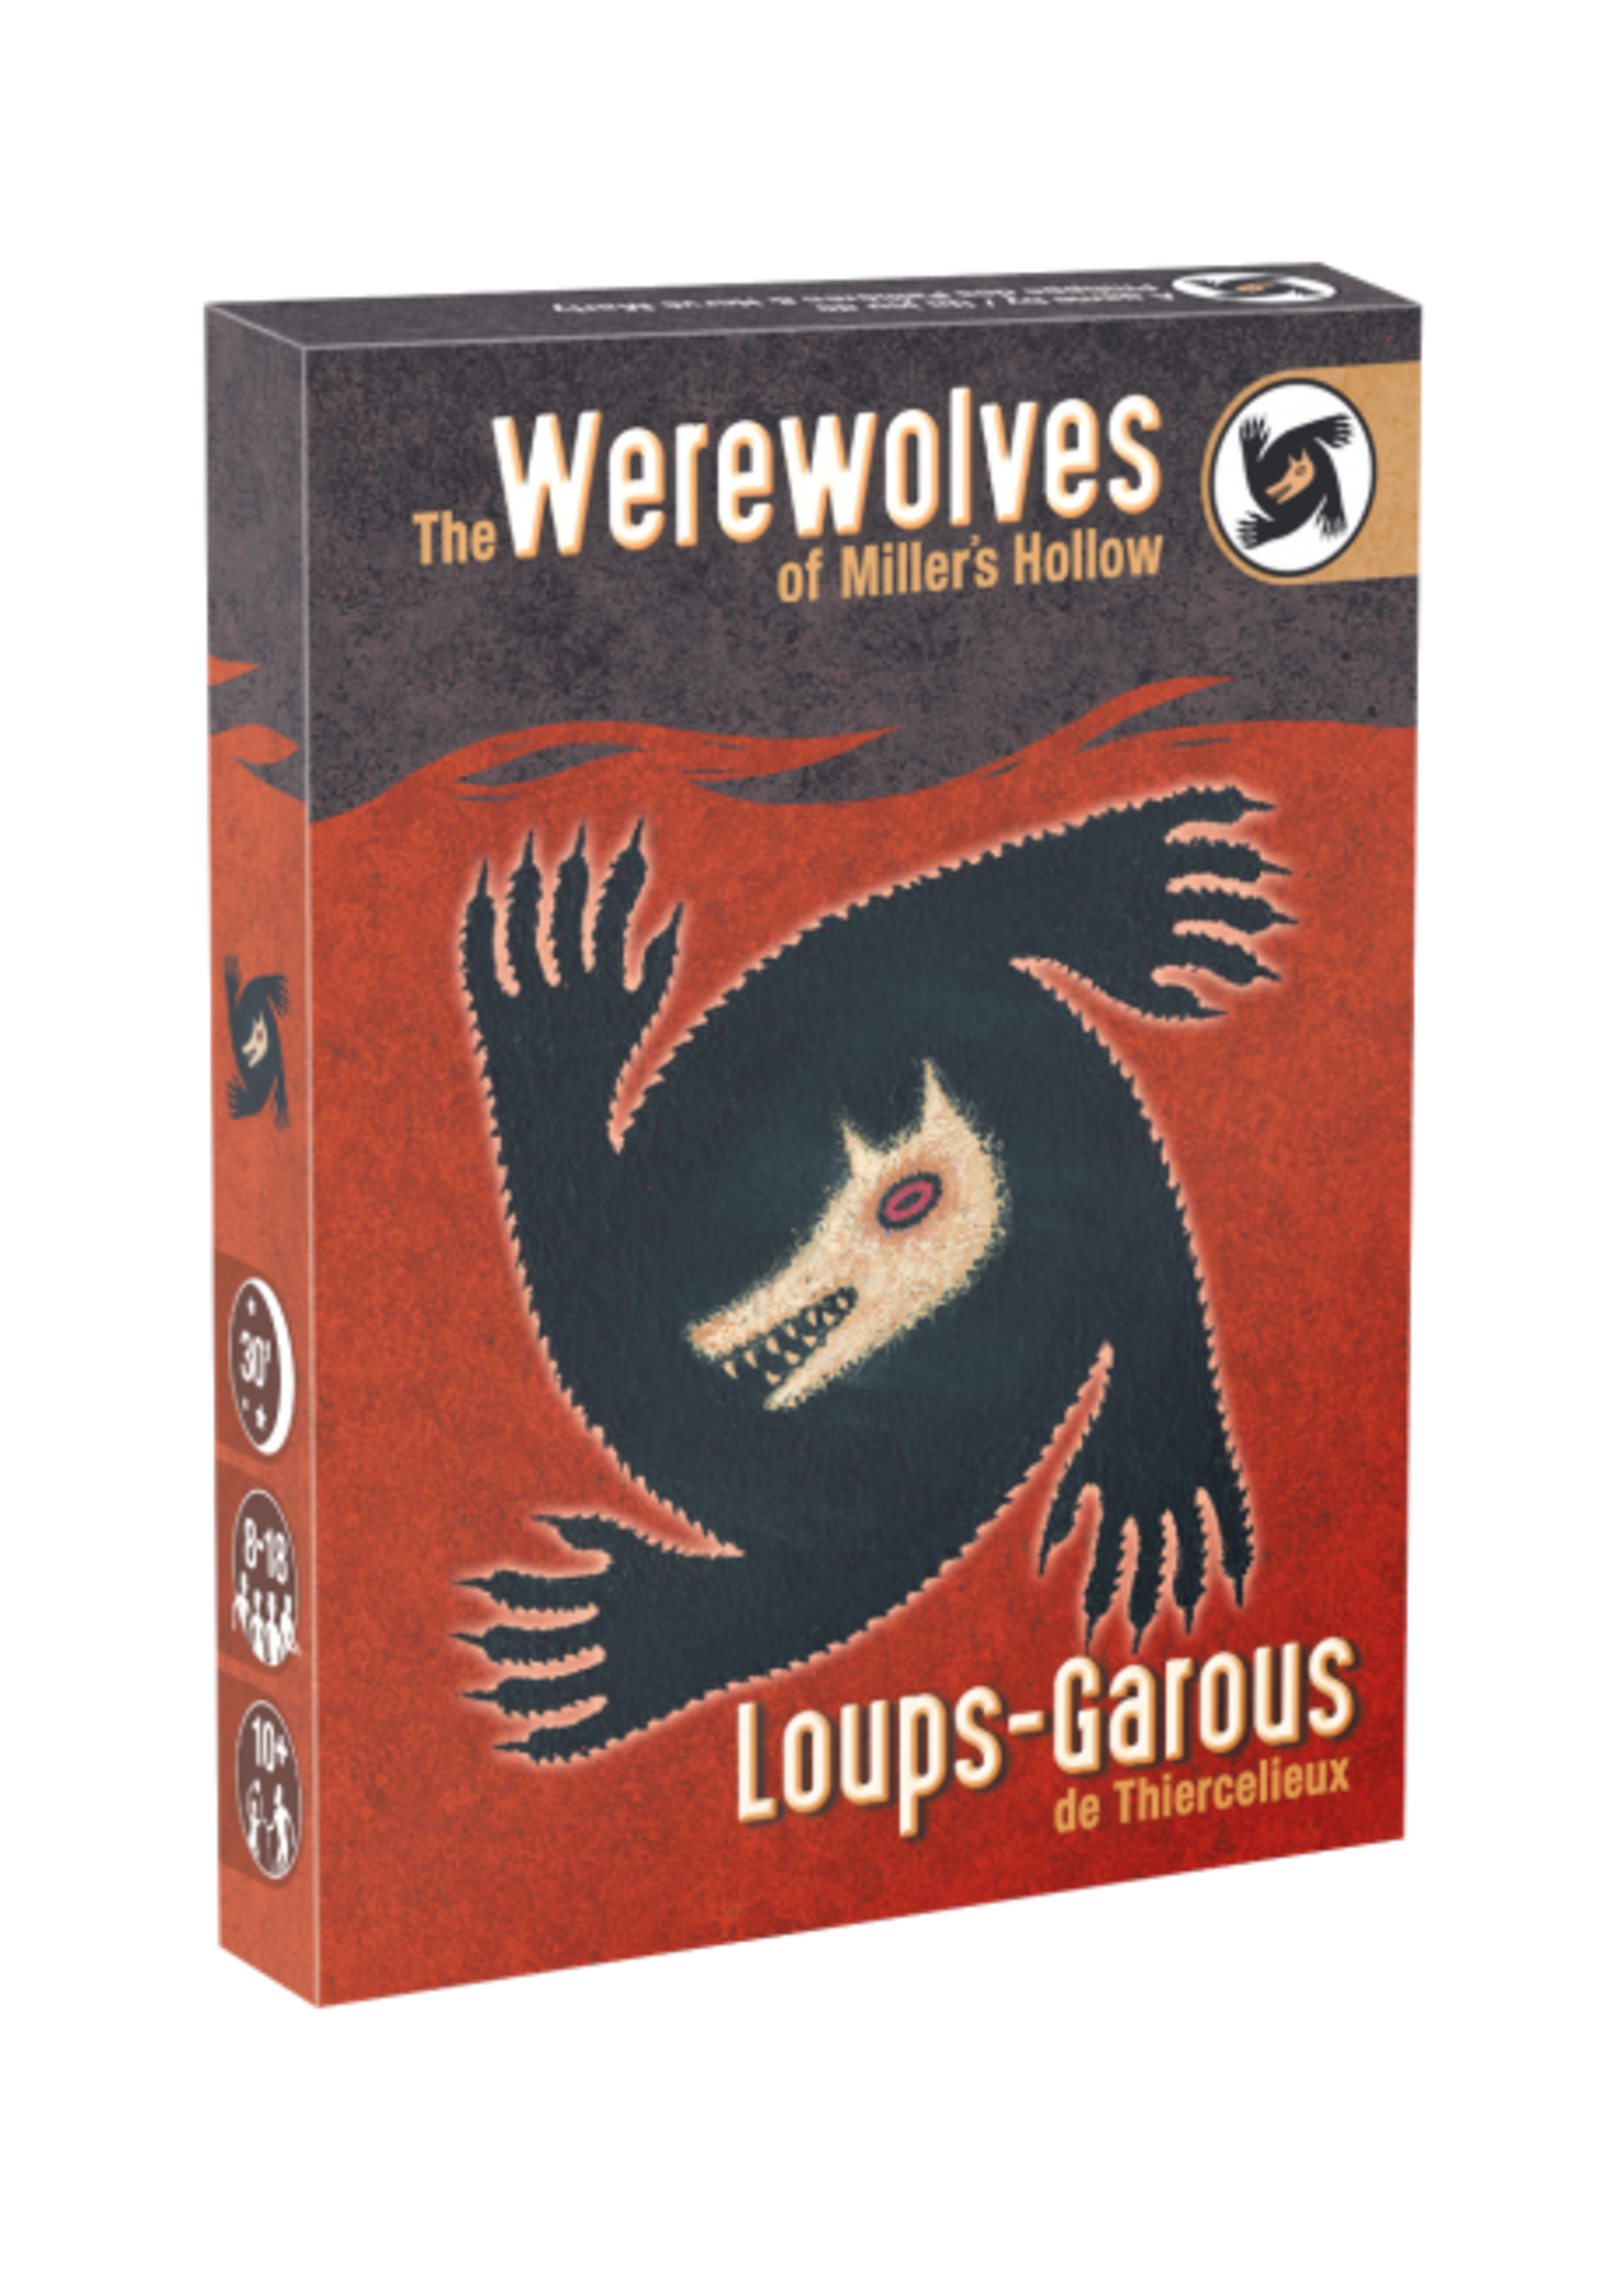 Werewolves The Werewolves of Miller's Hollow